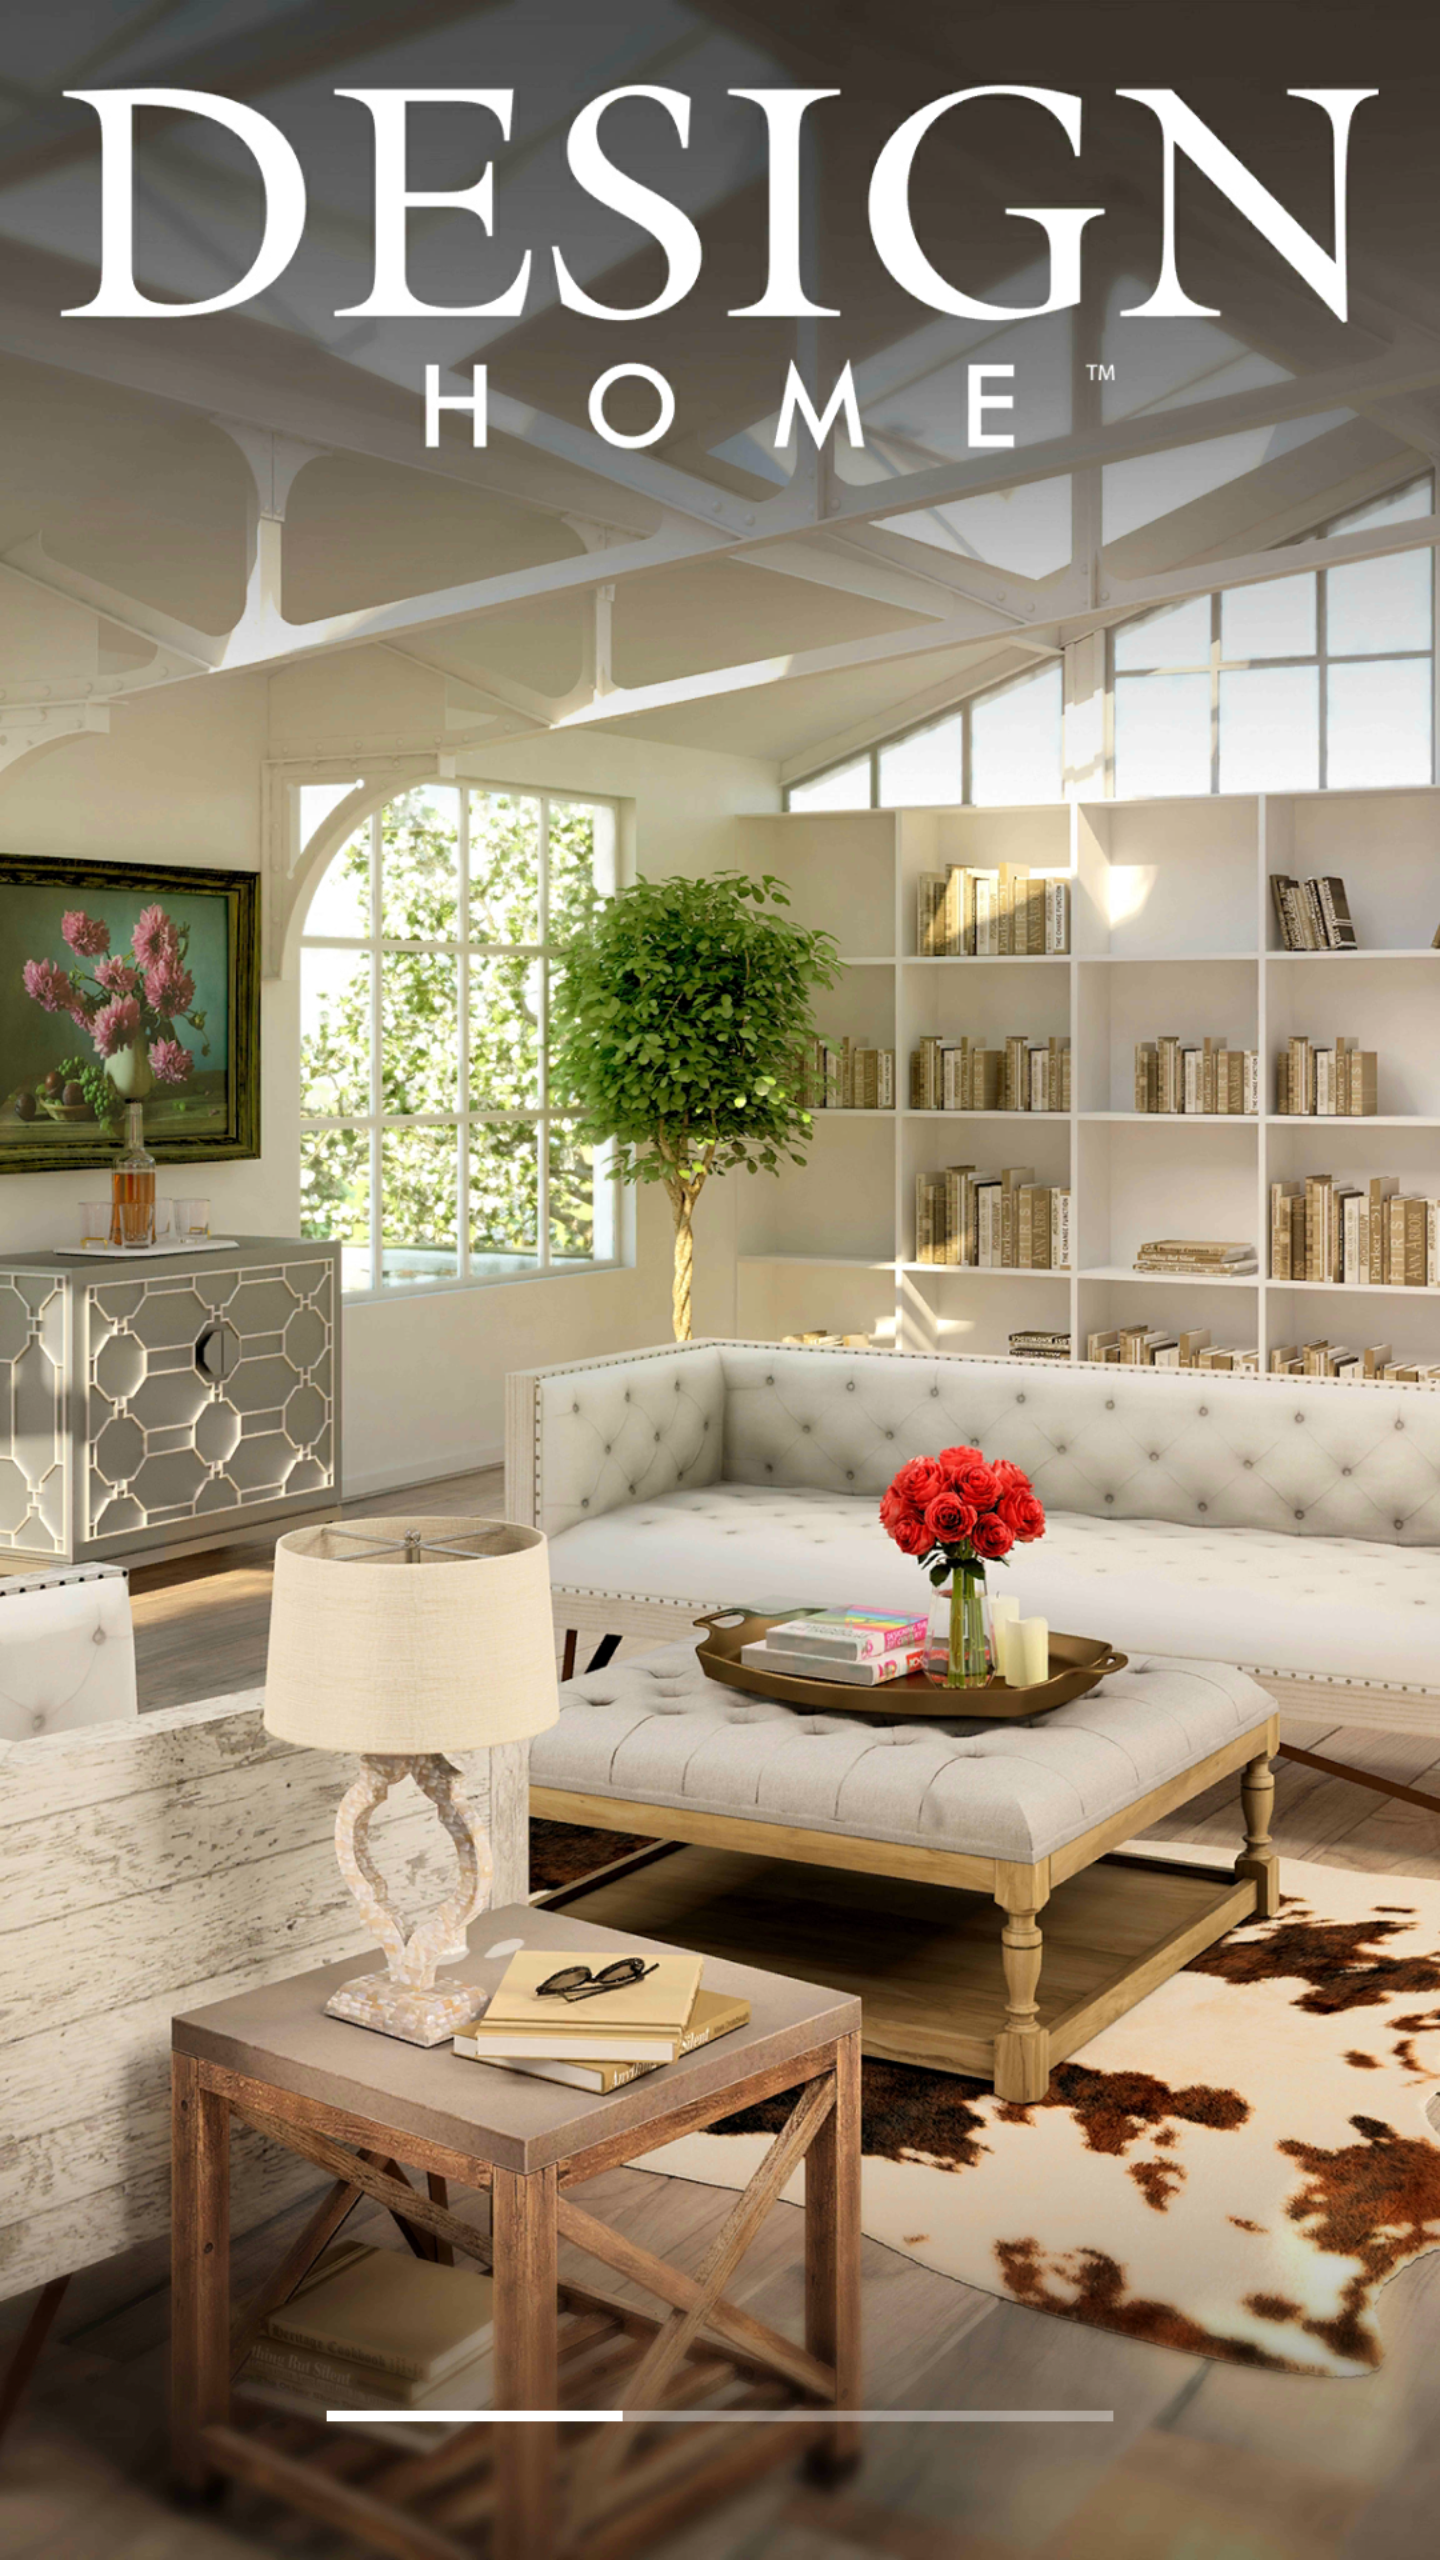 Design Home Guide [Tips & Tricks] - Online Fanatic